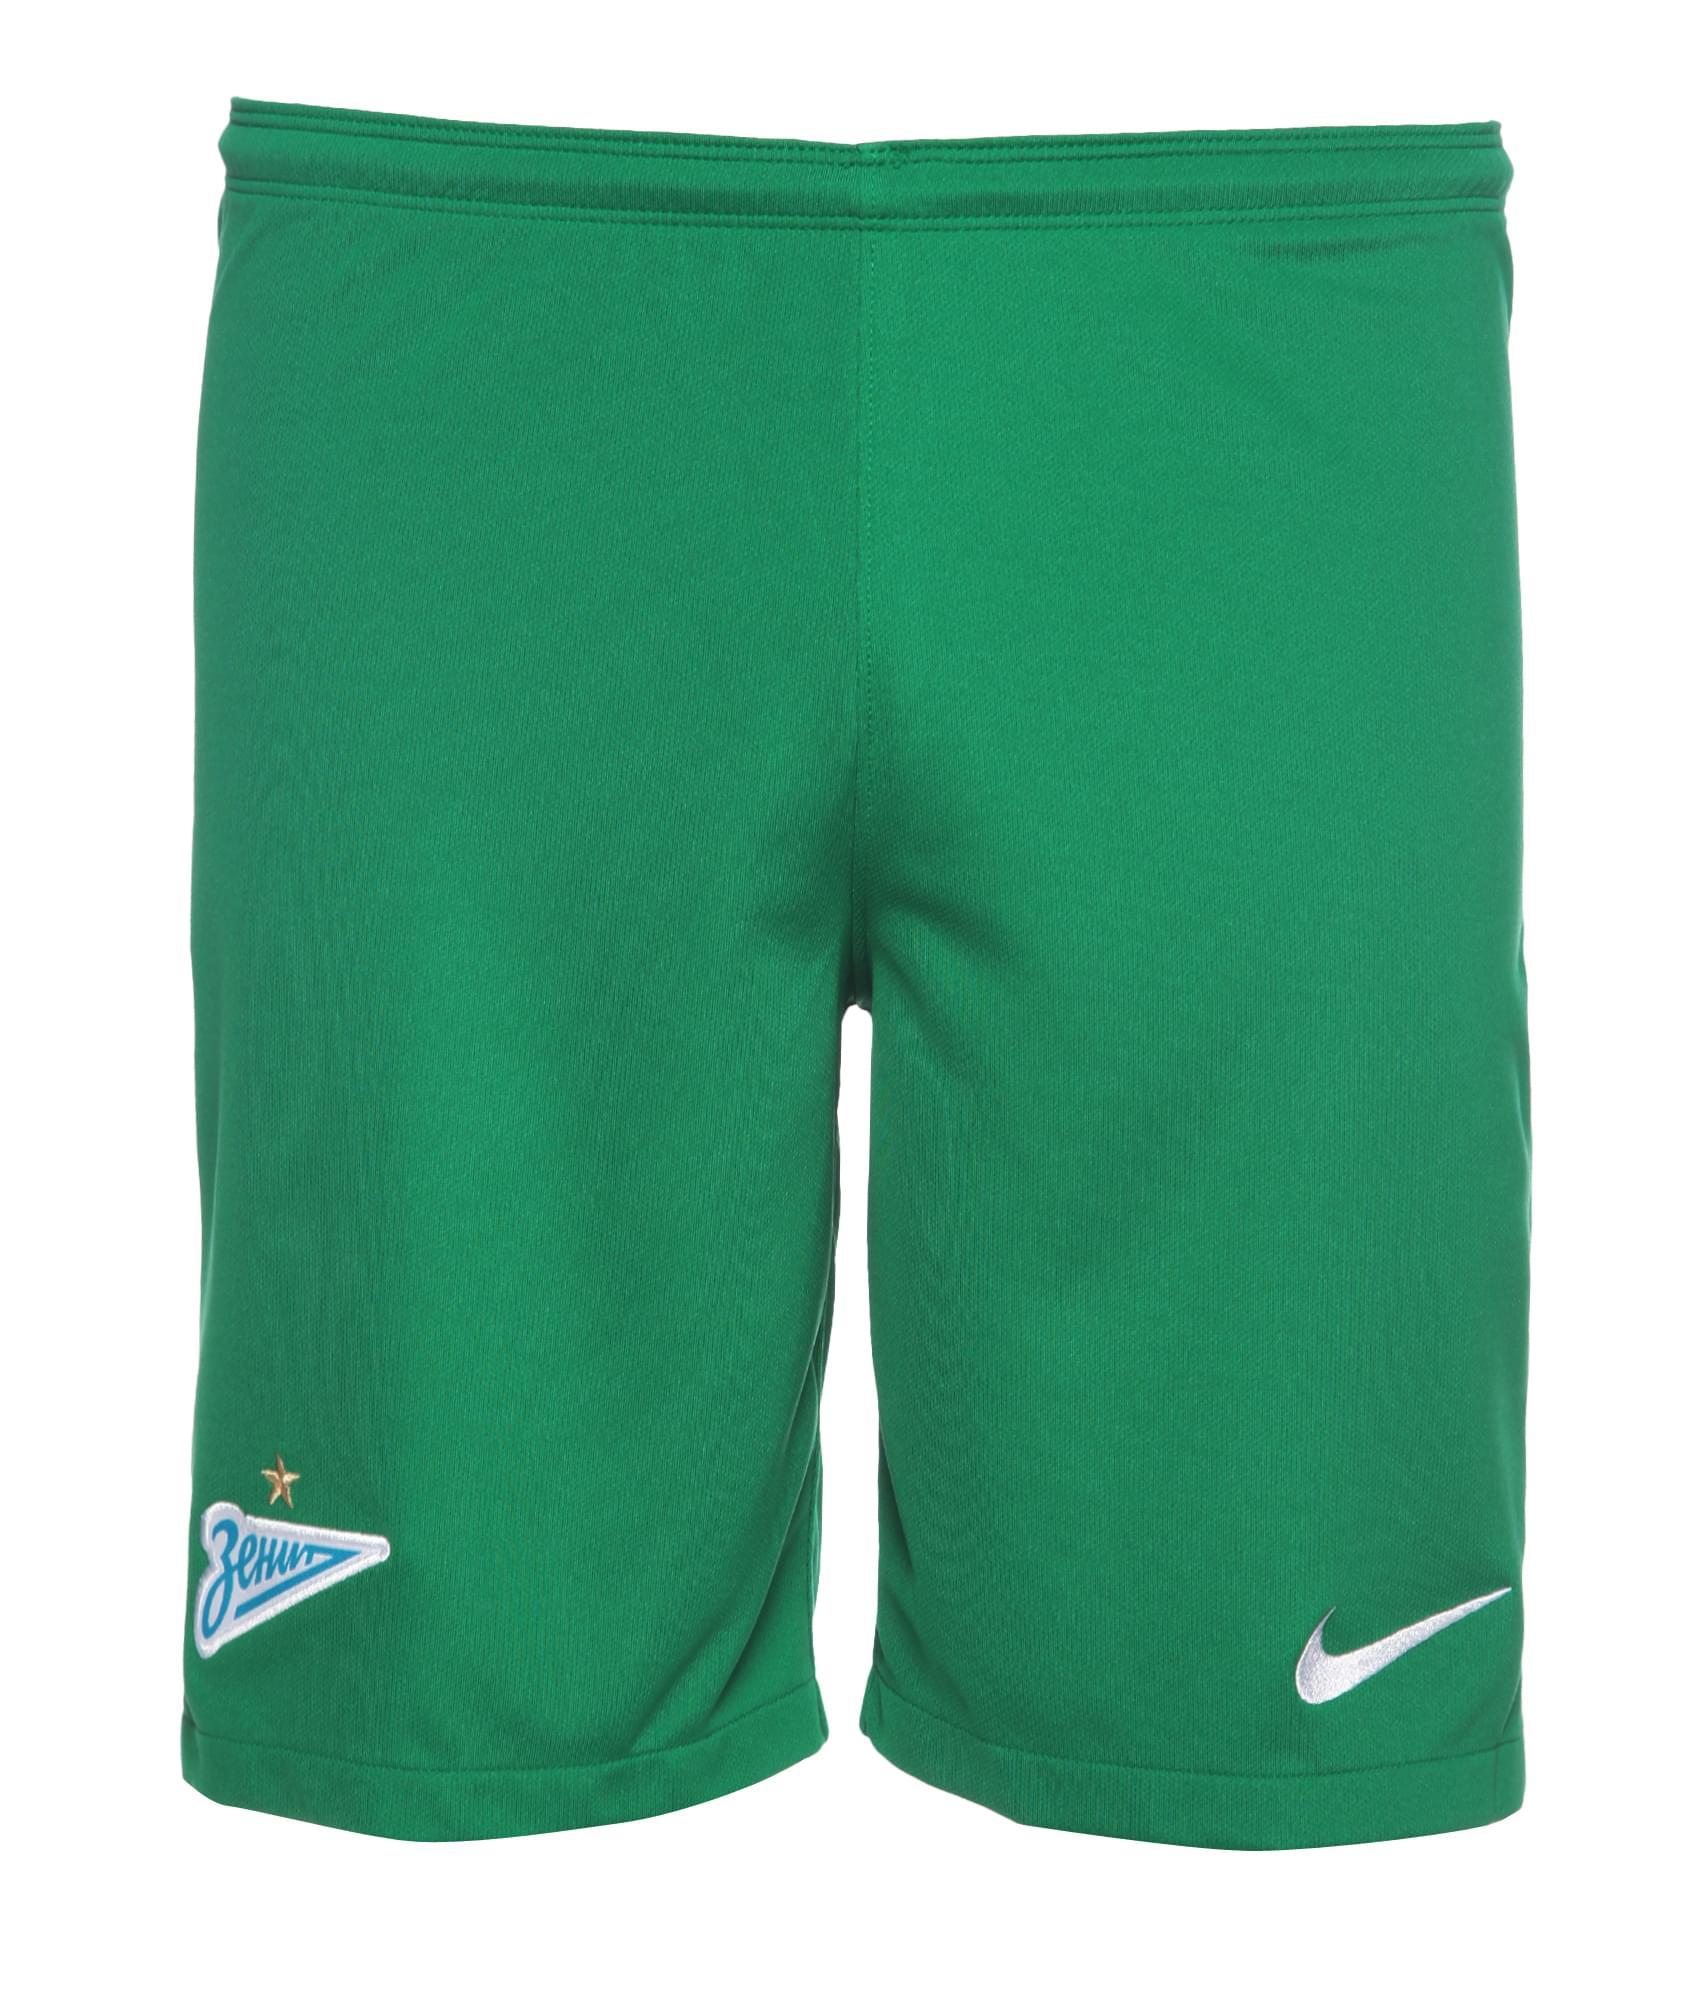 Шорты вратарские Nike сезона 2017/2018 Nike Цвет-Зеленый